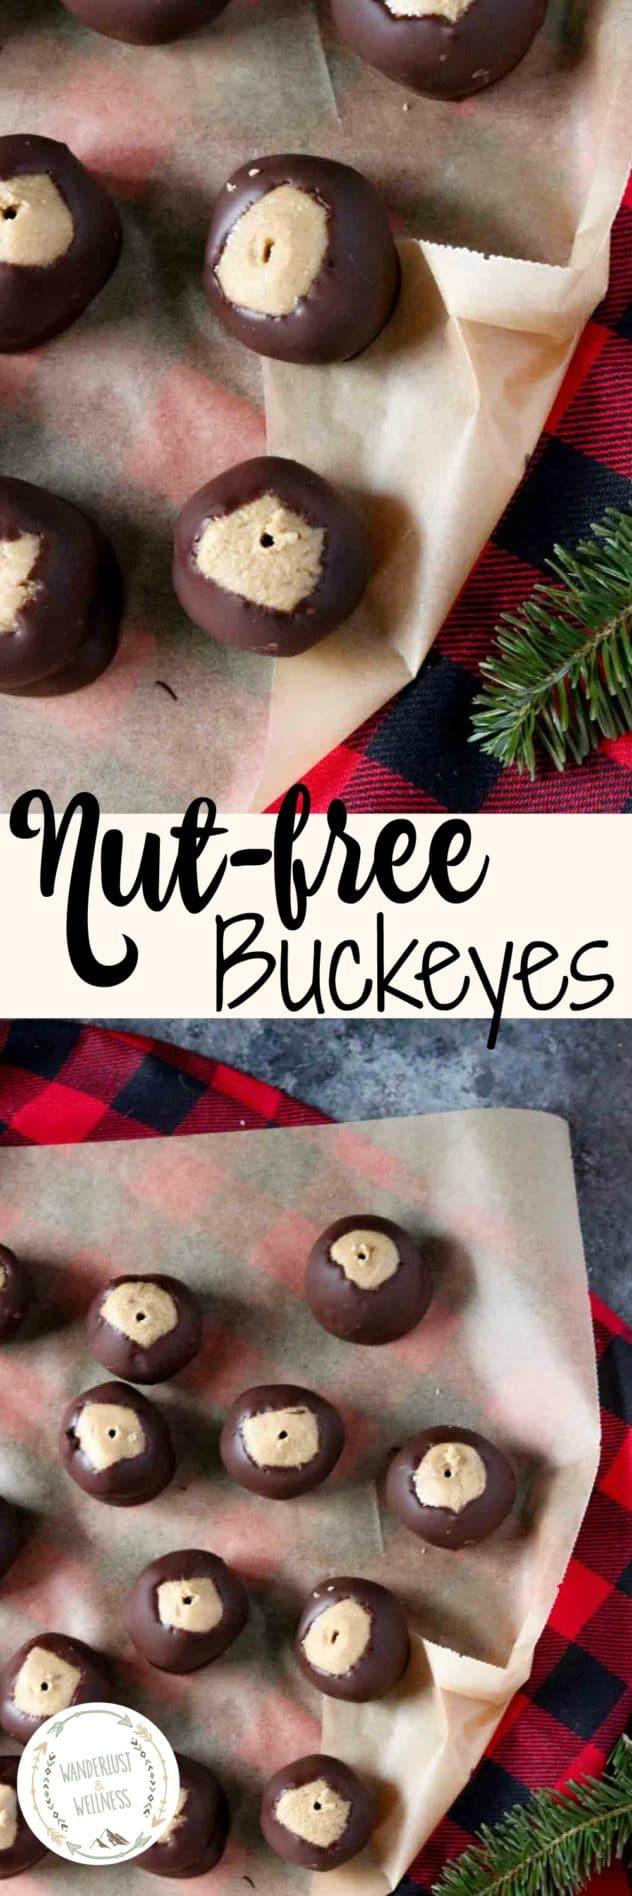 Nut-free Buckeyes